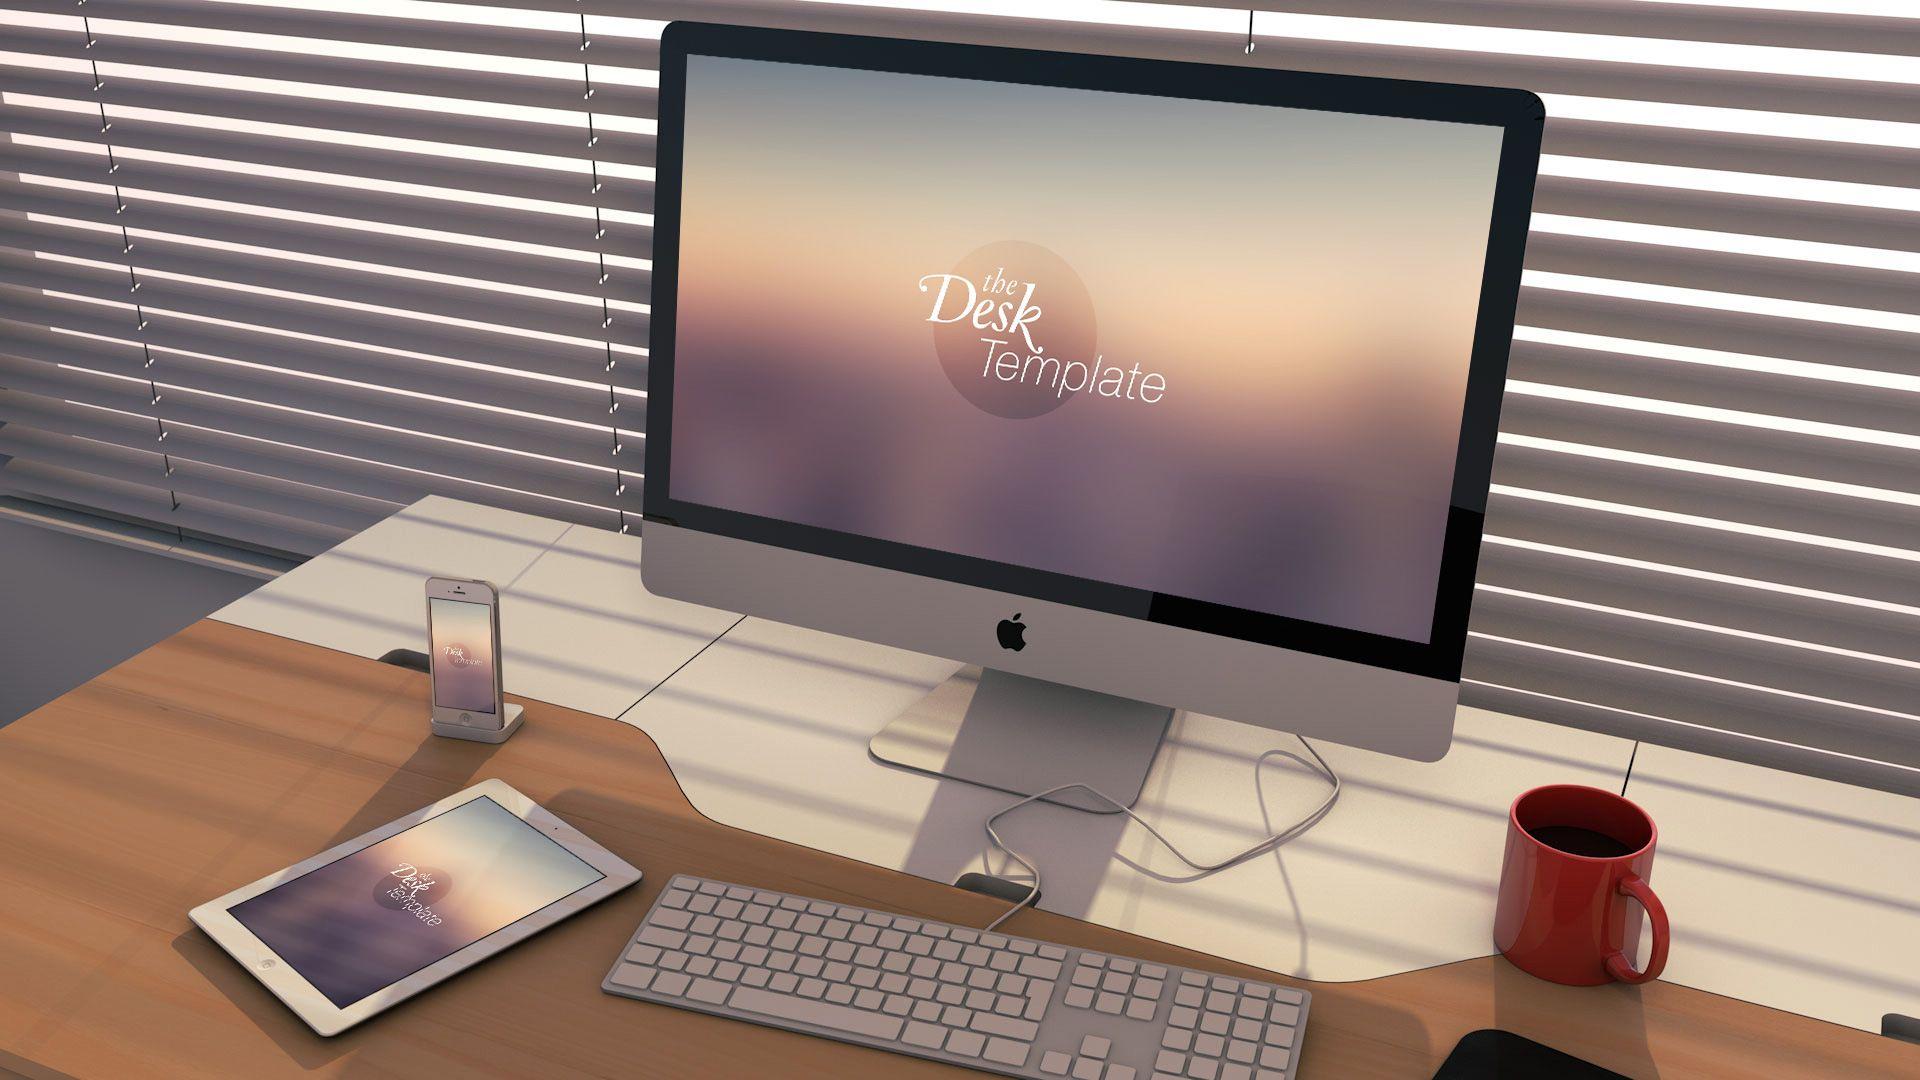 The Desk Mockup Template